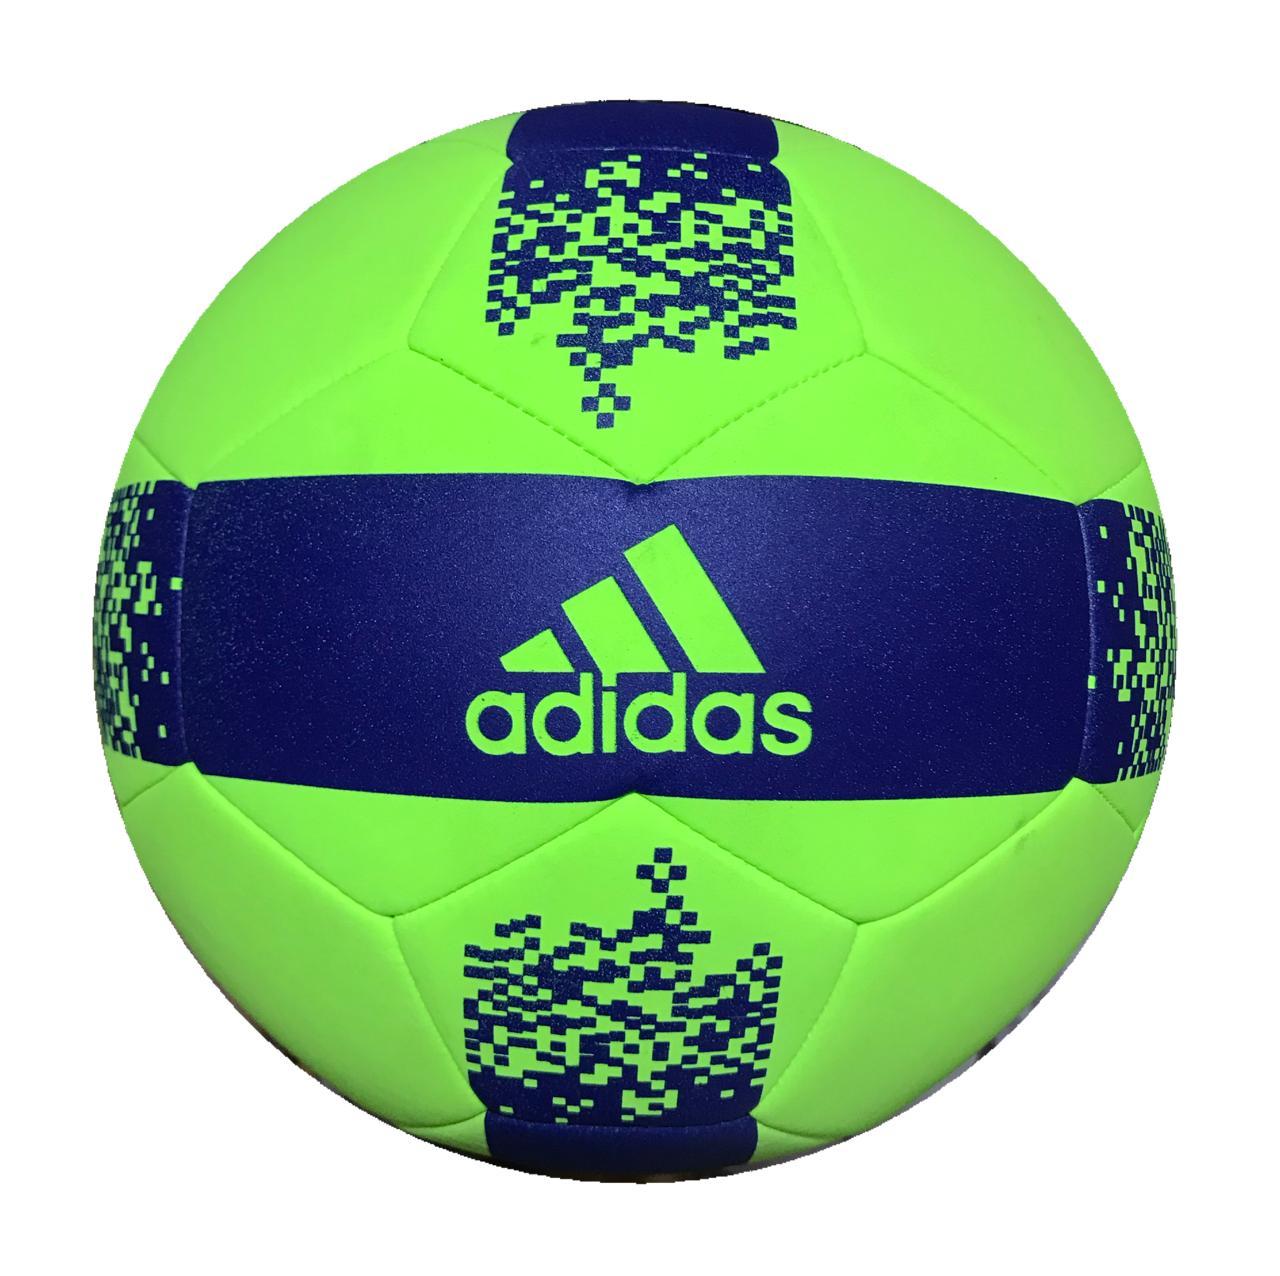 Hybrid Technology Football EPP ll / Soccer Ball / Green Color / 26 Panels